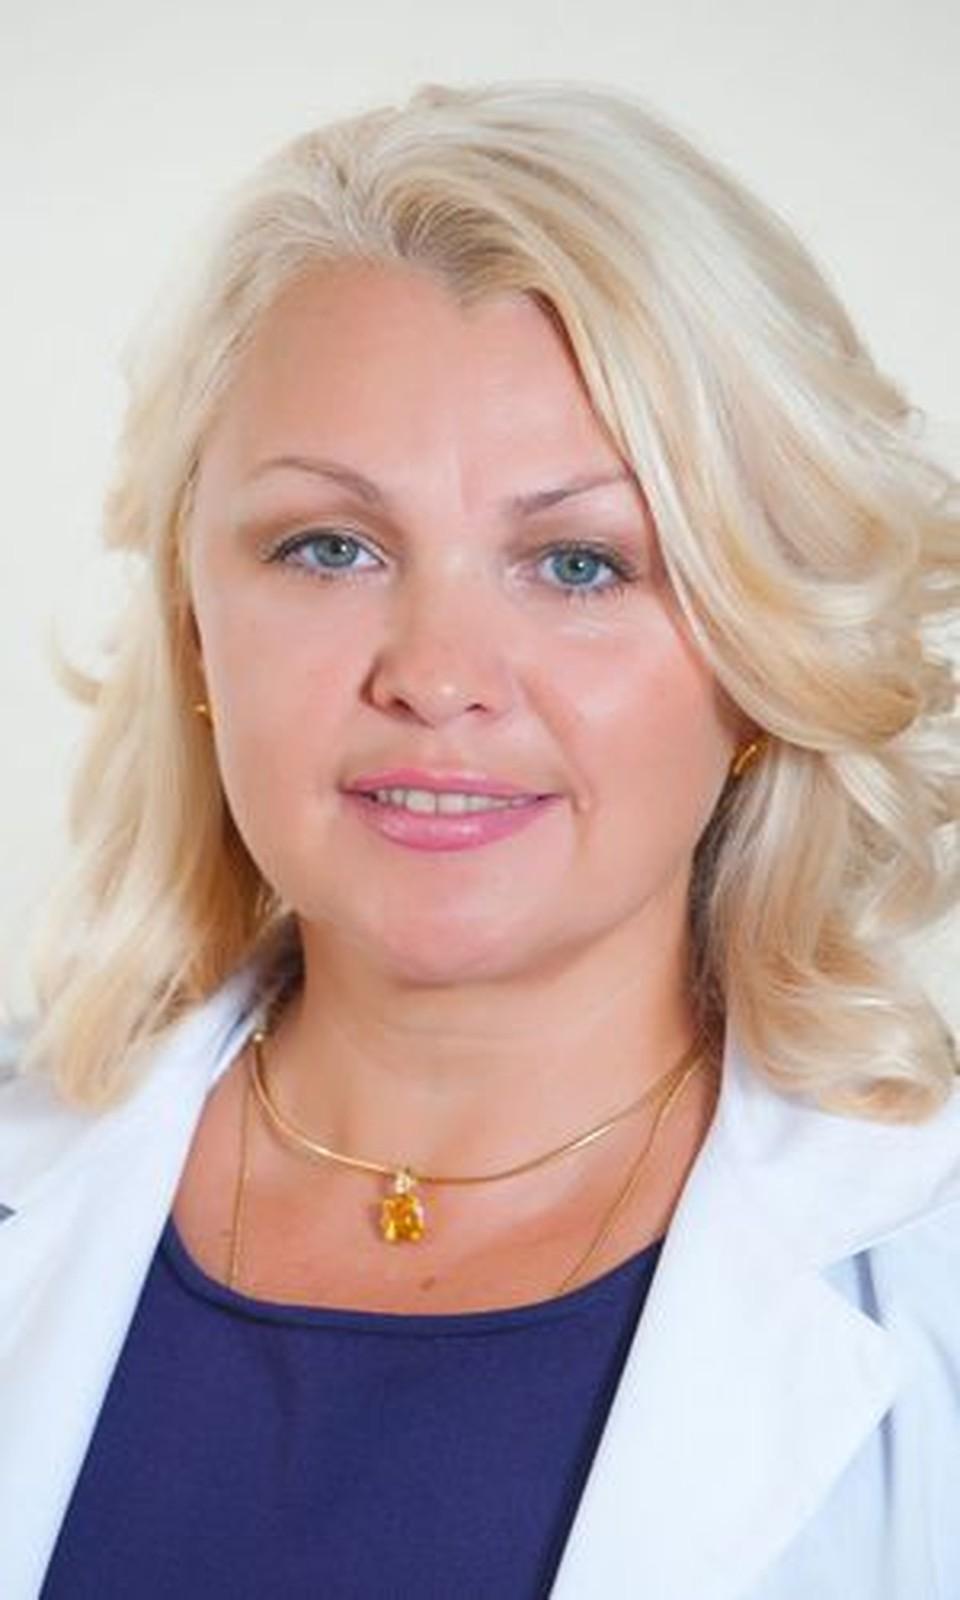 Светлана Гусева много заработала за счет продажи имущества ФОТО: ГП № 6